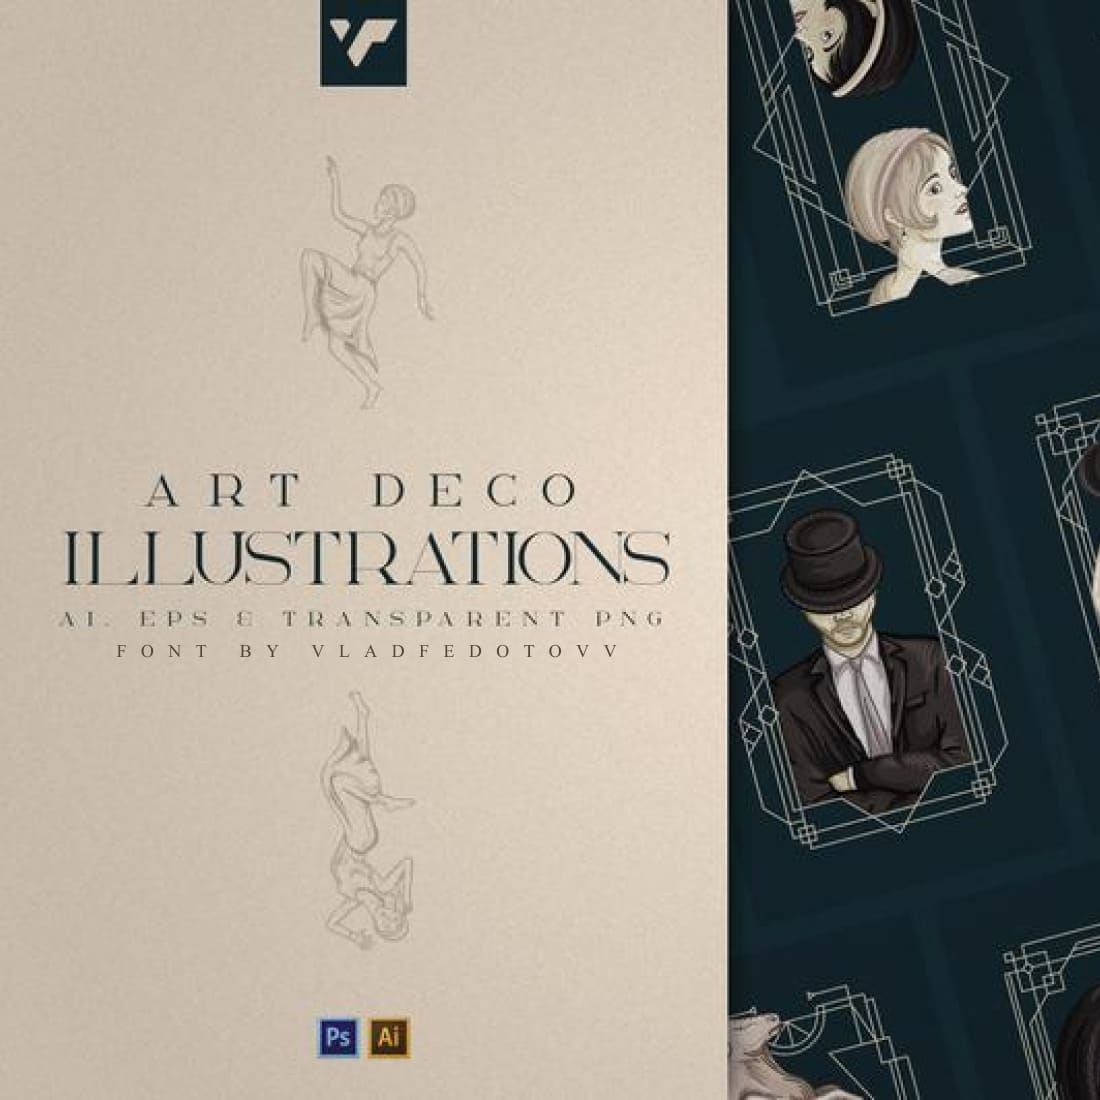 Art Deco illustrations – Ai EPS PSD cover image.